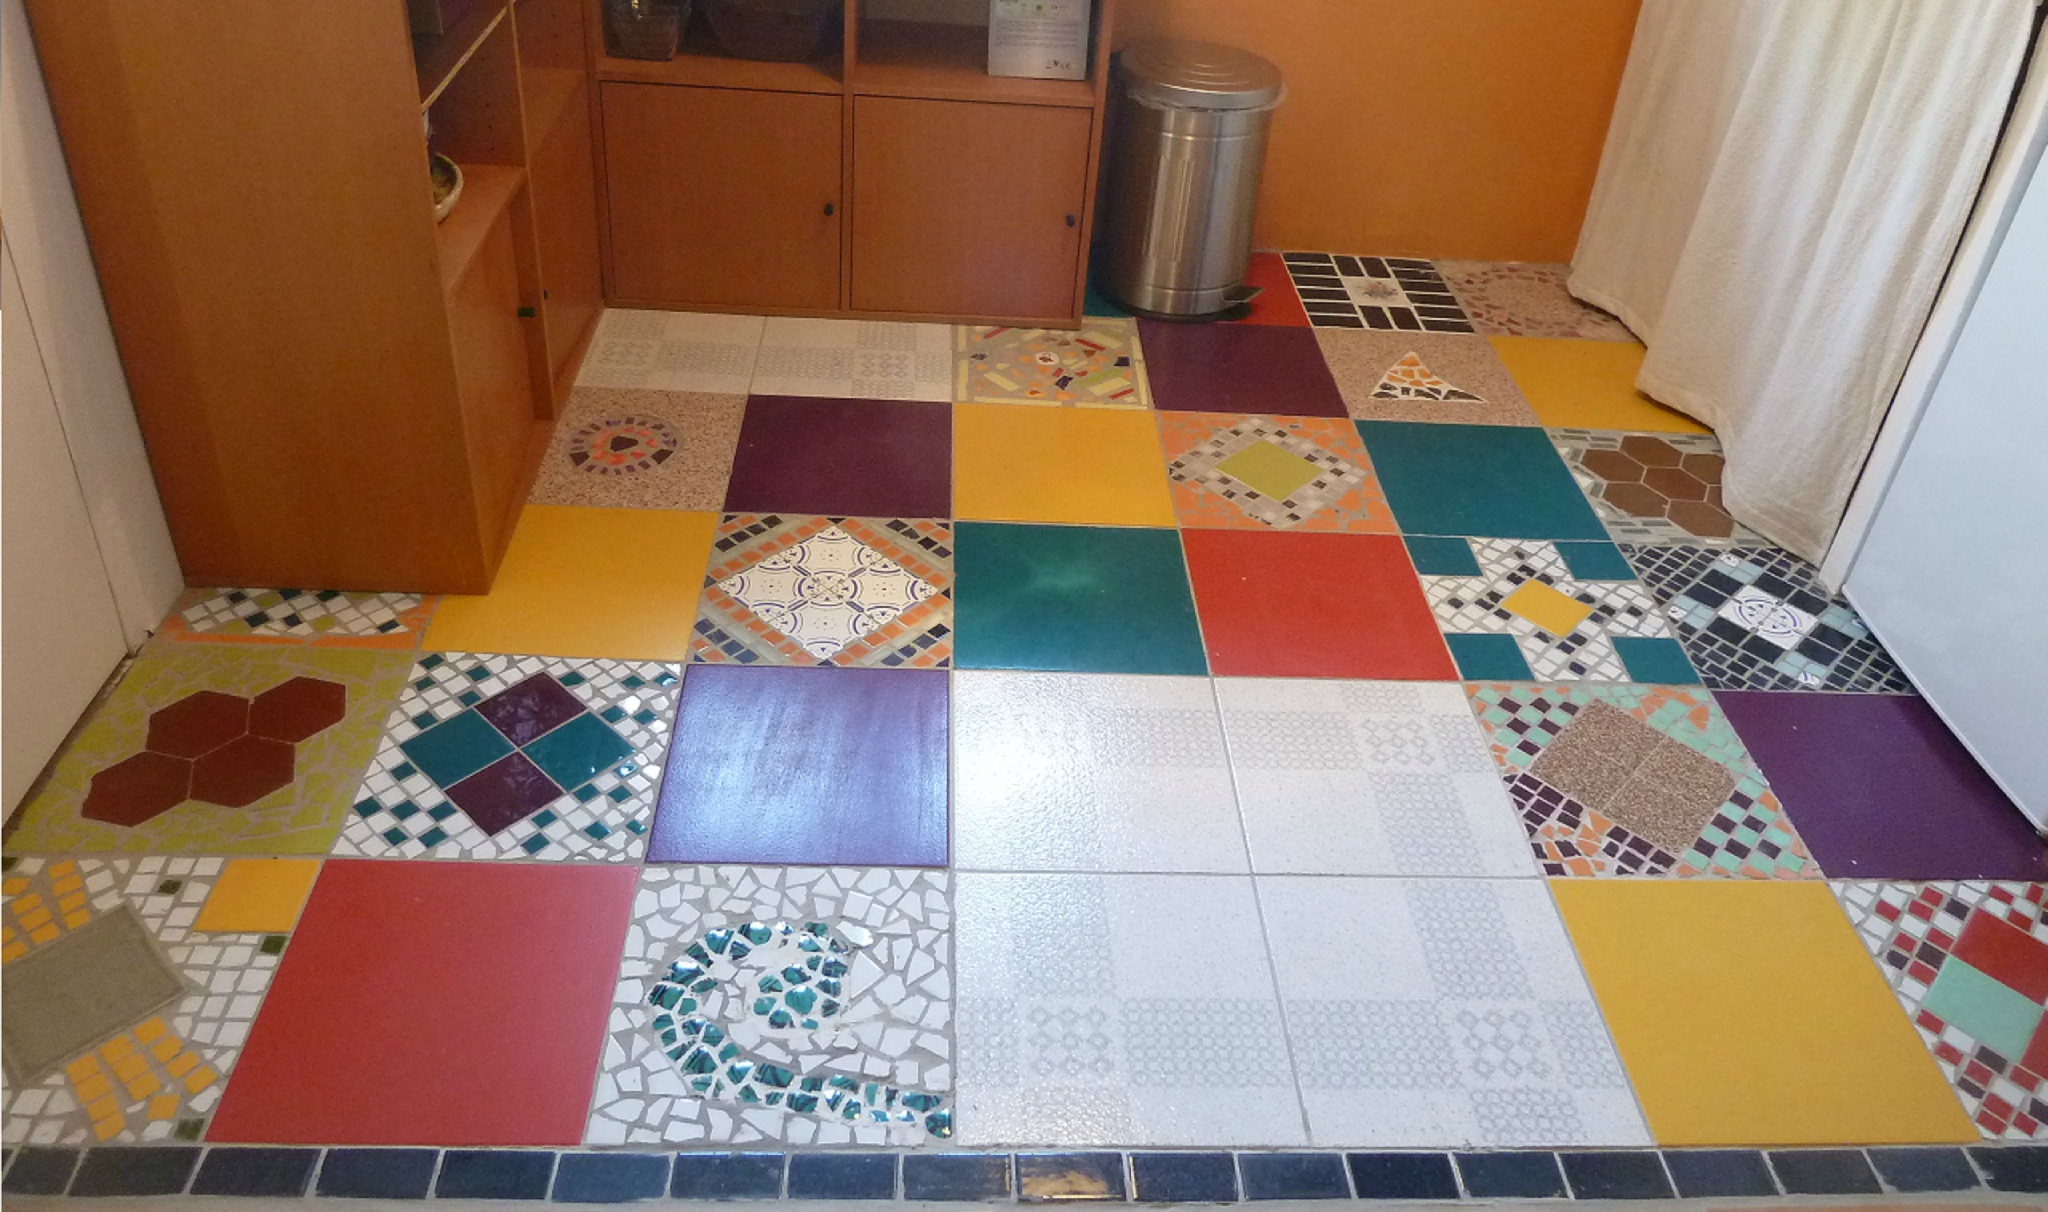 Carrelage Mosaique Sol Carrelage Mosaique Sol Pas Cher Idees Conception Jardin Idees Conception Jardin